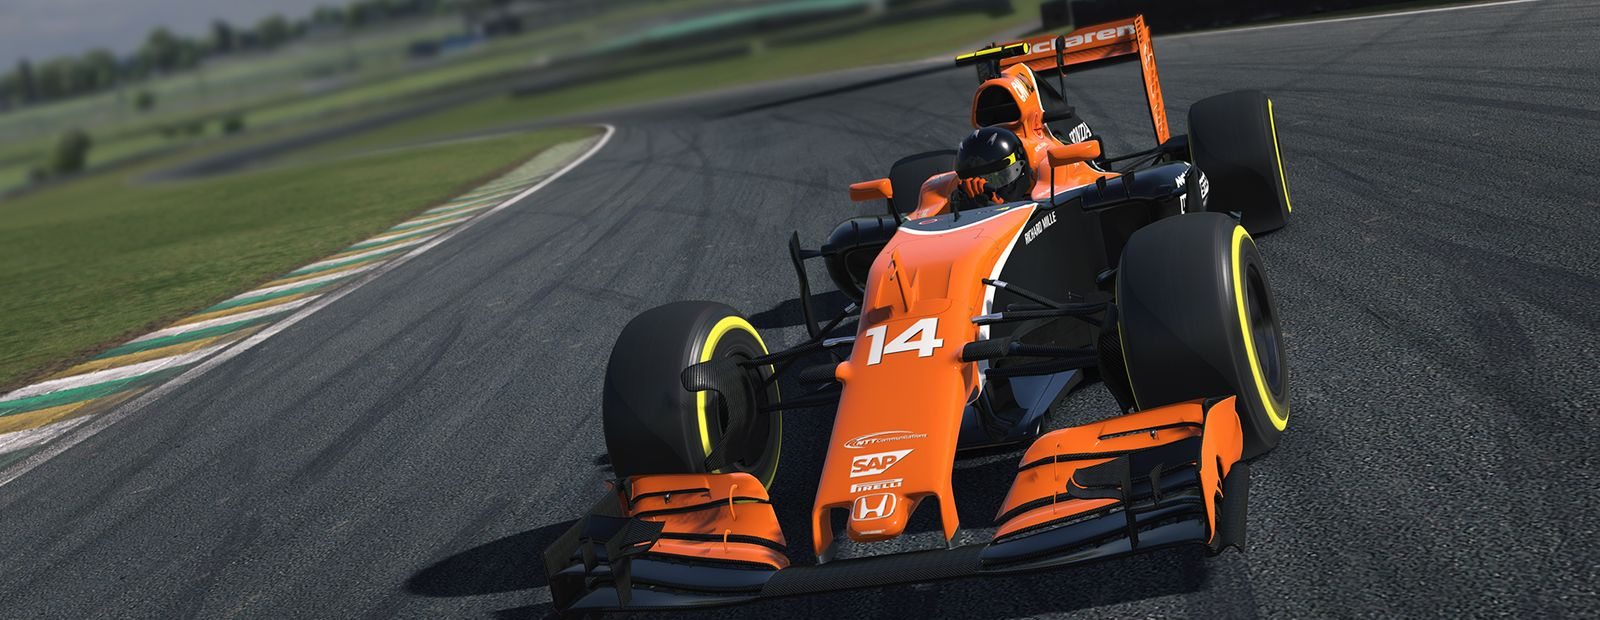 iRacing McLaren WFG 2